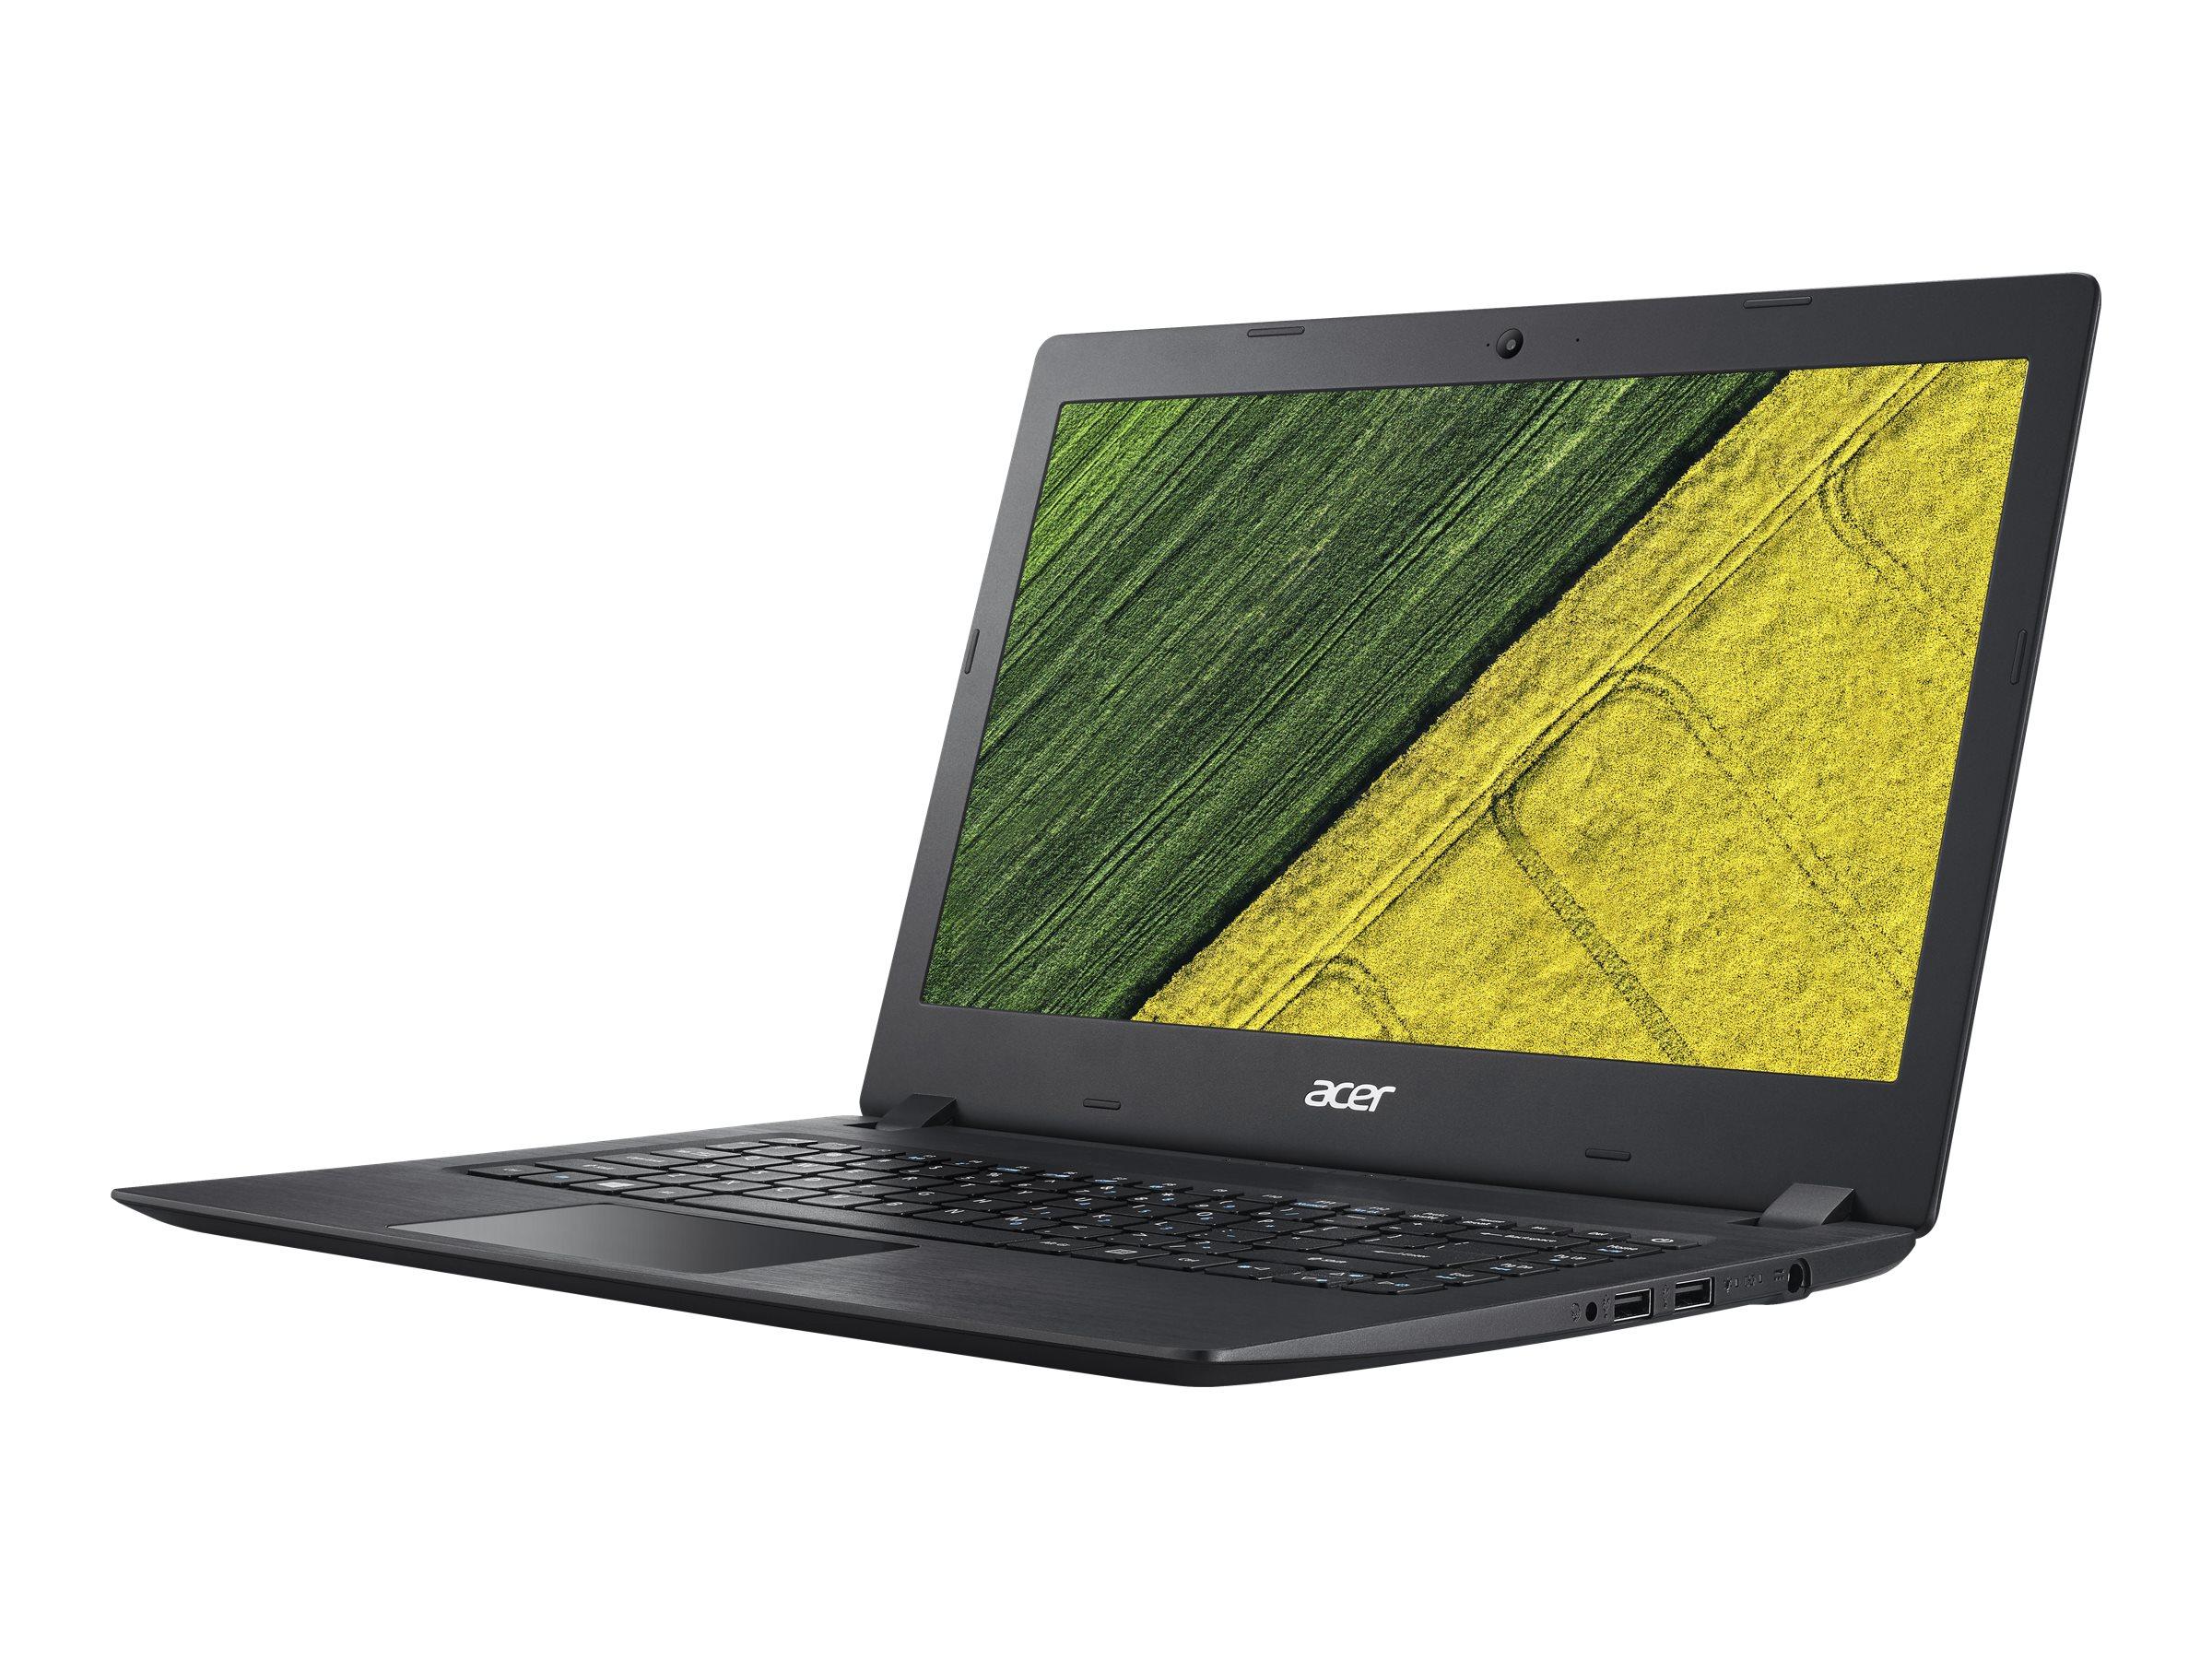 "Acer Aspire A114-31 - 14"" Notebook - Celeron 2,2 GHz 35,6 cm"